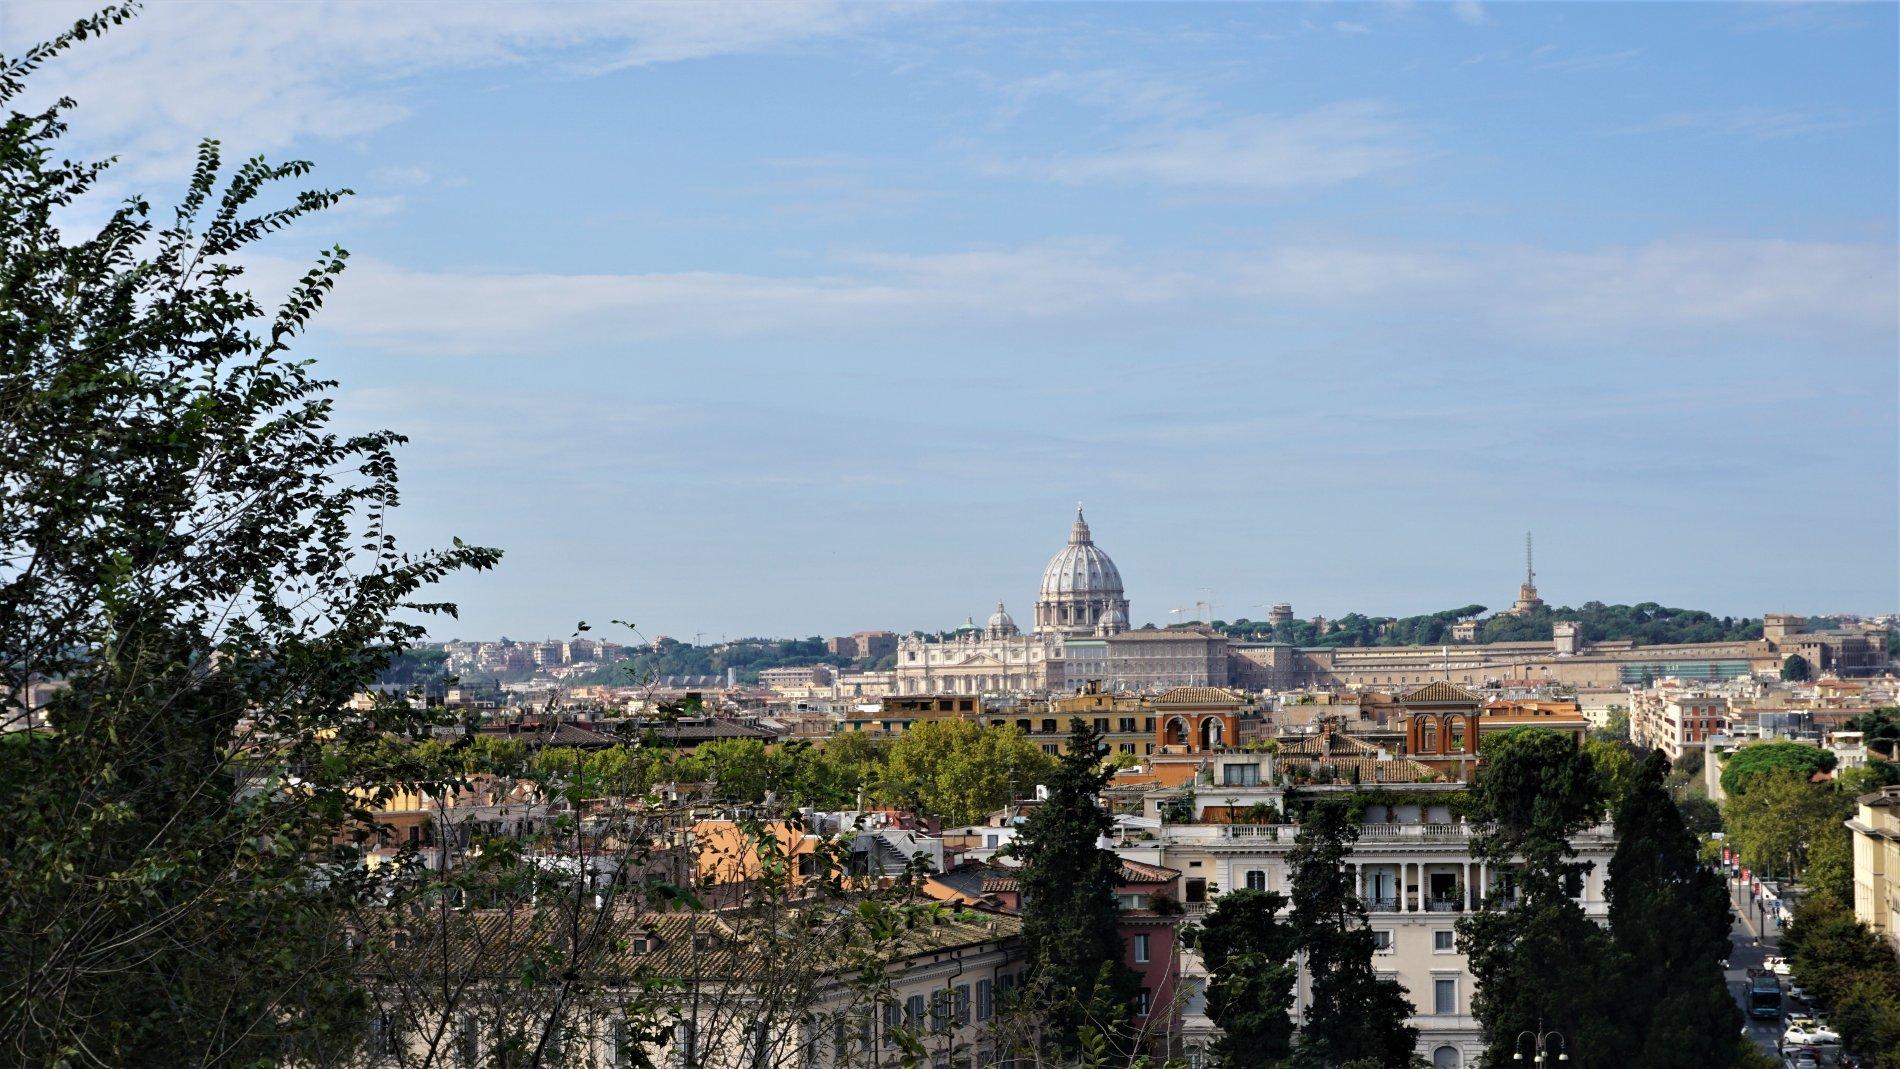 Stunning views of the Italian capital from the Pincio Terrace. Source: Truevoyagers